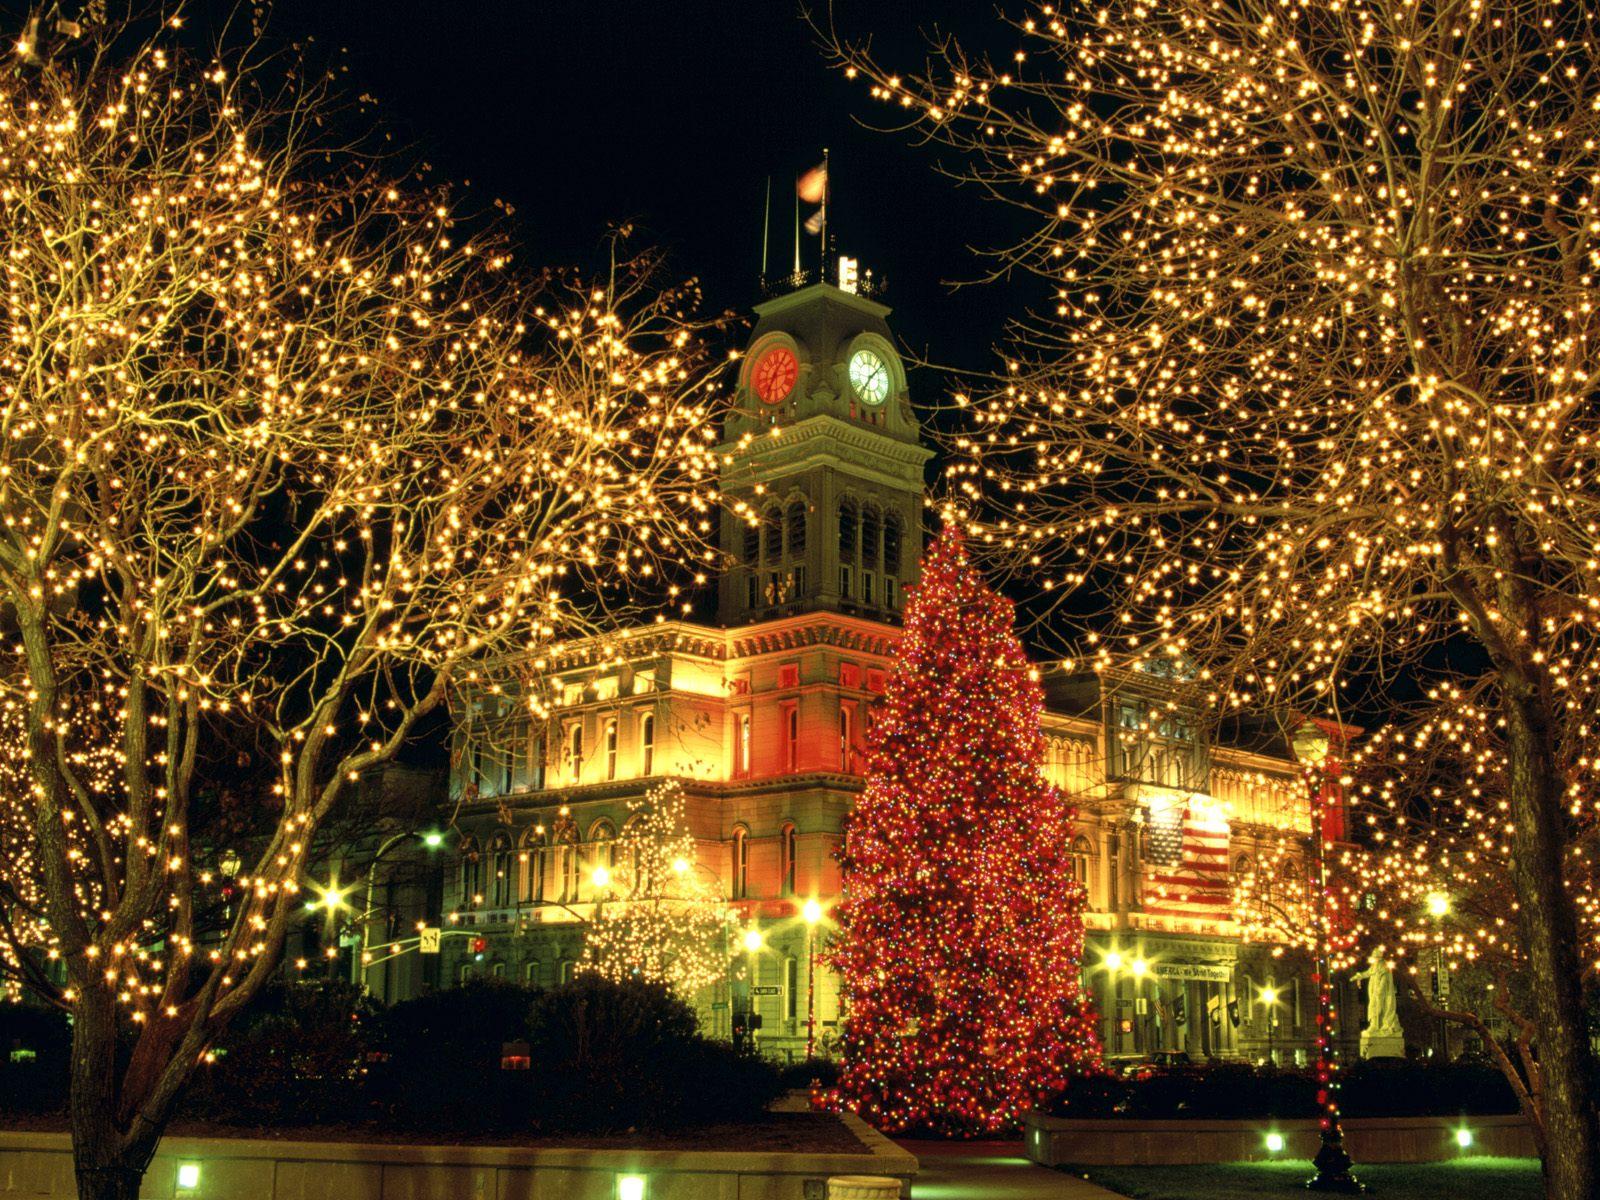 (Holiday – Christmas) – Wallpapers4Desktop.com 014